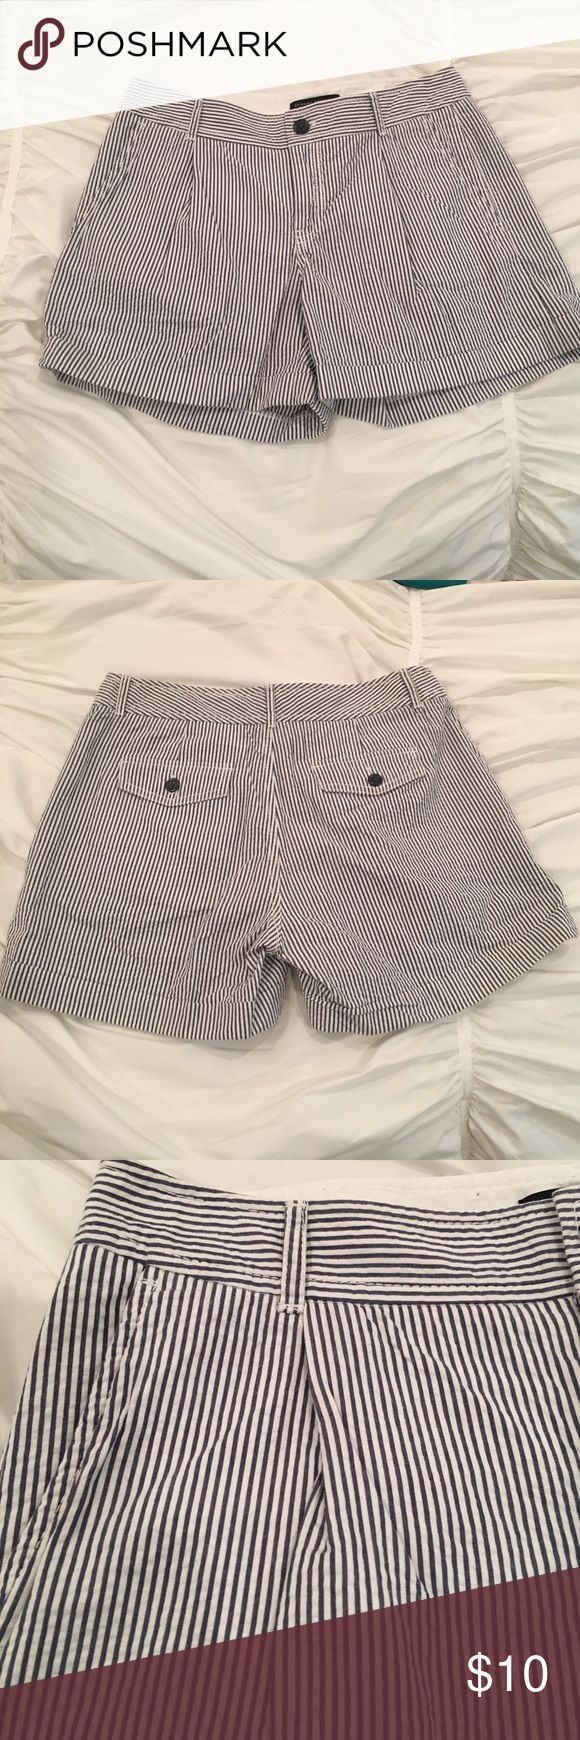 "BANANA REPUBLIC ""Martin Fit"" Blue Pinstripe Shorts BANANA REPUBLIC ""Martin Fit"" Blue Pinstripe Shorts (Size 4) Banana Republic Shorts"